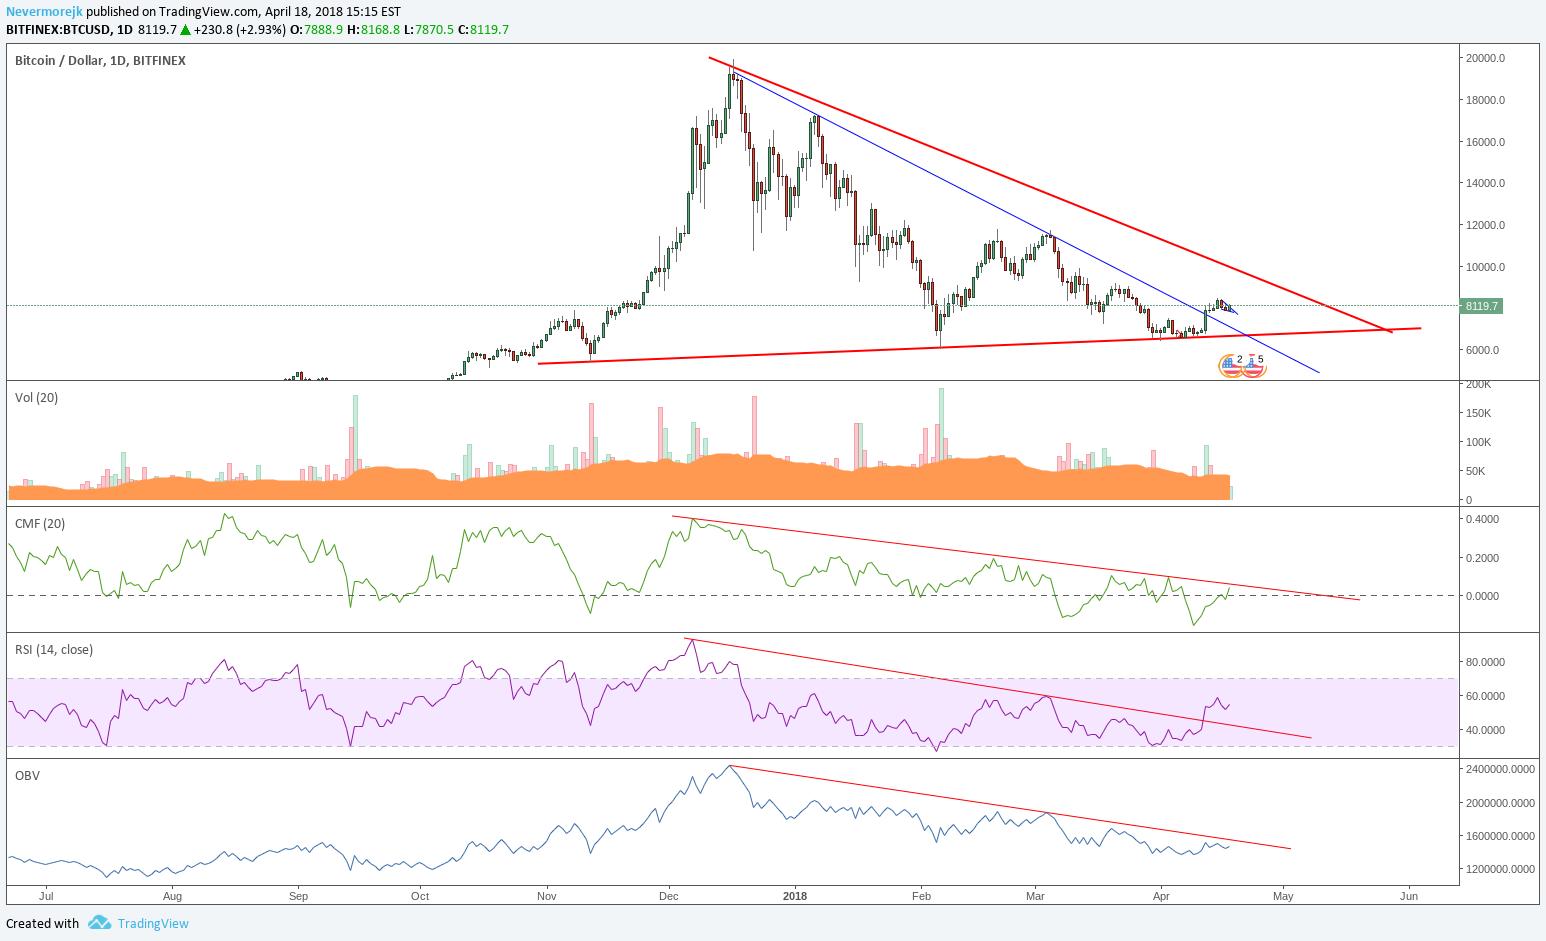 Log vs Linear Crypto Trading for BITFINEX:BTCUSD by Nevermorejk